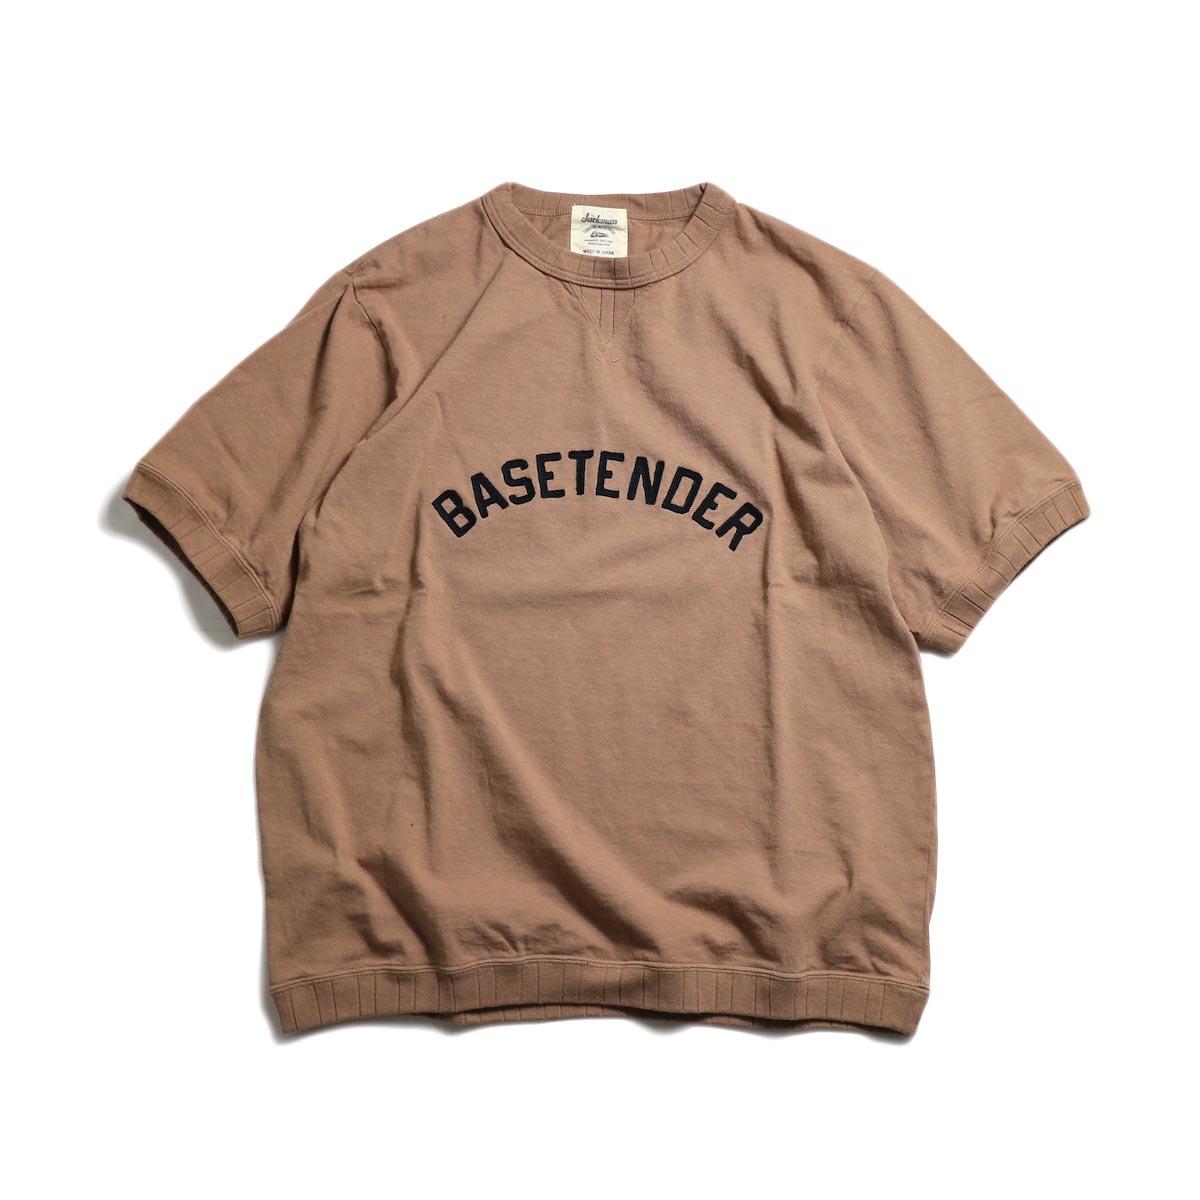 Jackman / Rib T-Shirt (BASETENDER) -Camden Brick